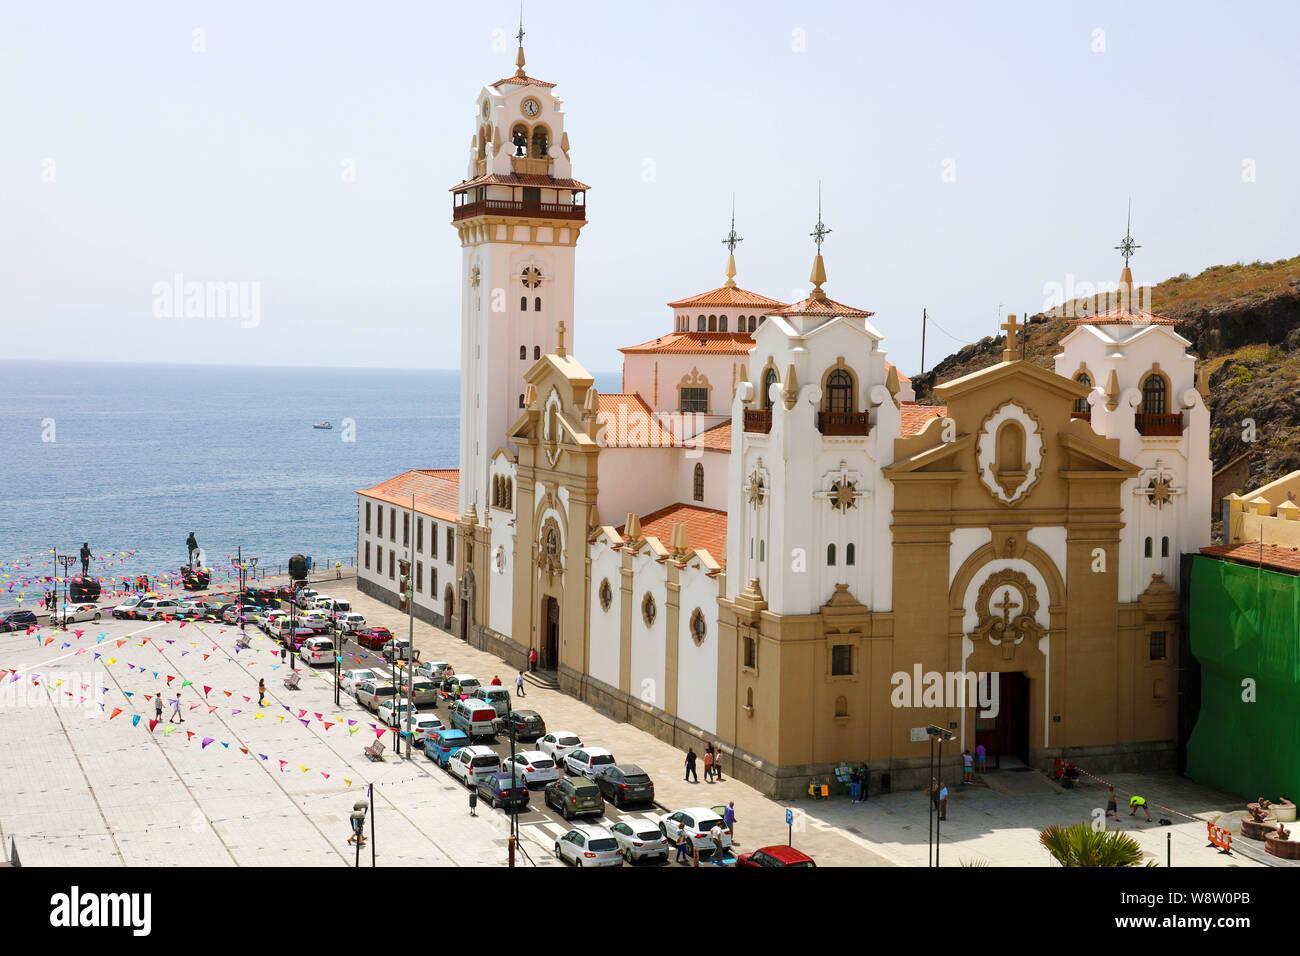 Basilica of Candelaria, Santa Cruz de Tenerife, Canary Islands, Spain Stock Photo